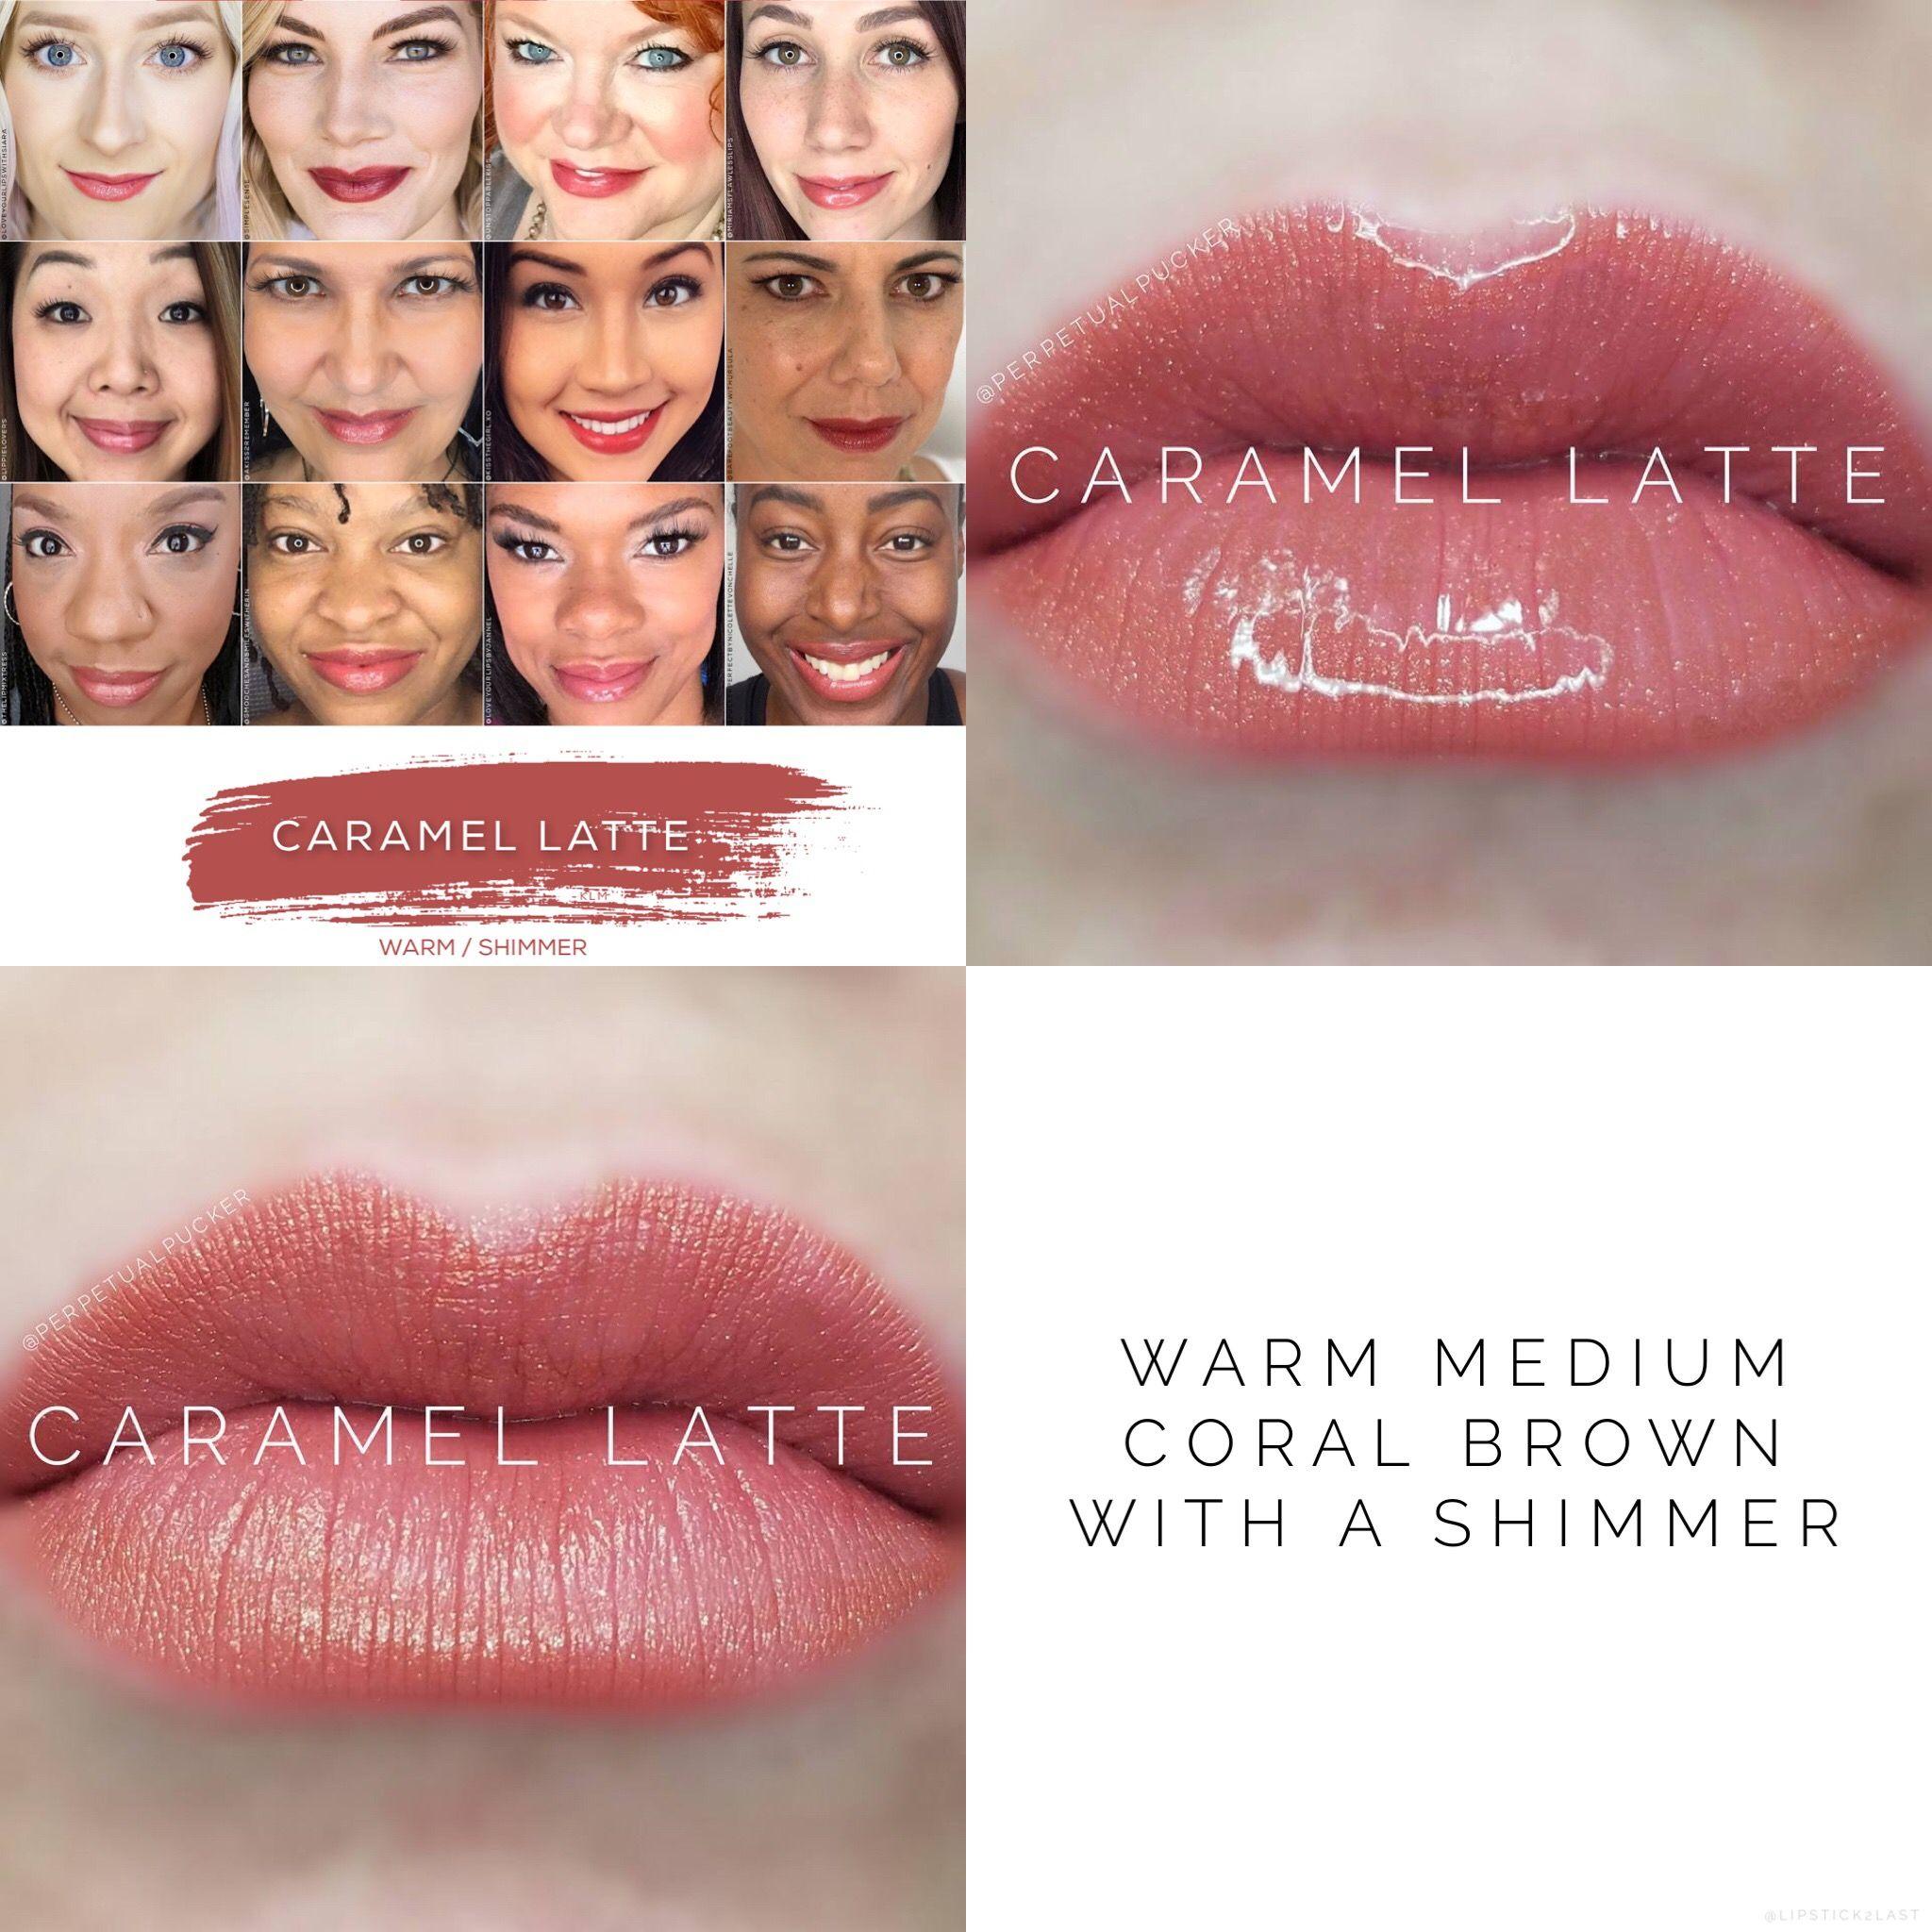 Caramel Latte LipSense Lip Color. Glossy Gloss versus Matte Gloss liquid lip color. NOT a lip stain. Long lasting lip color for 4-18+ hours of wear.